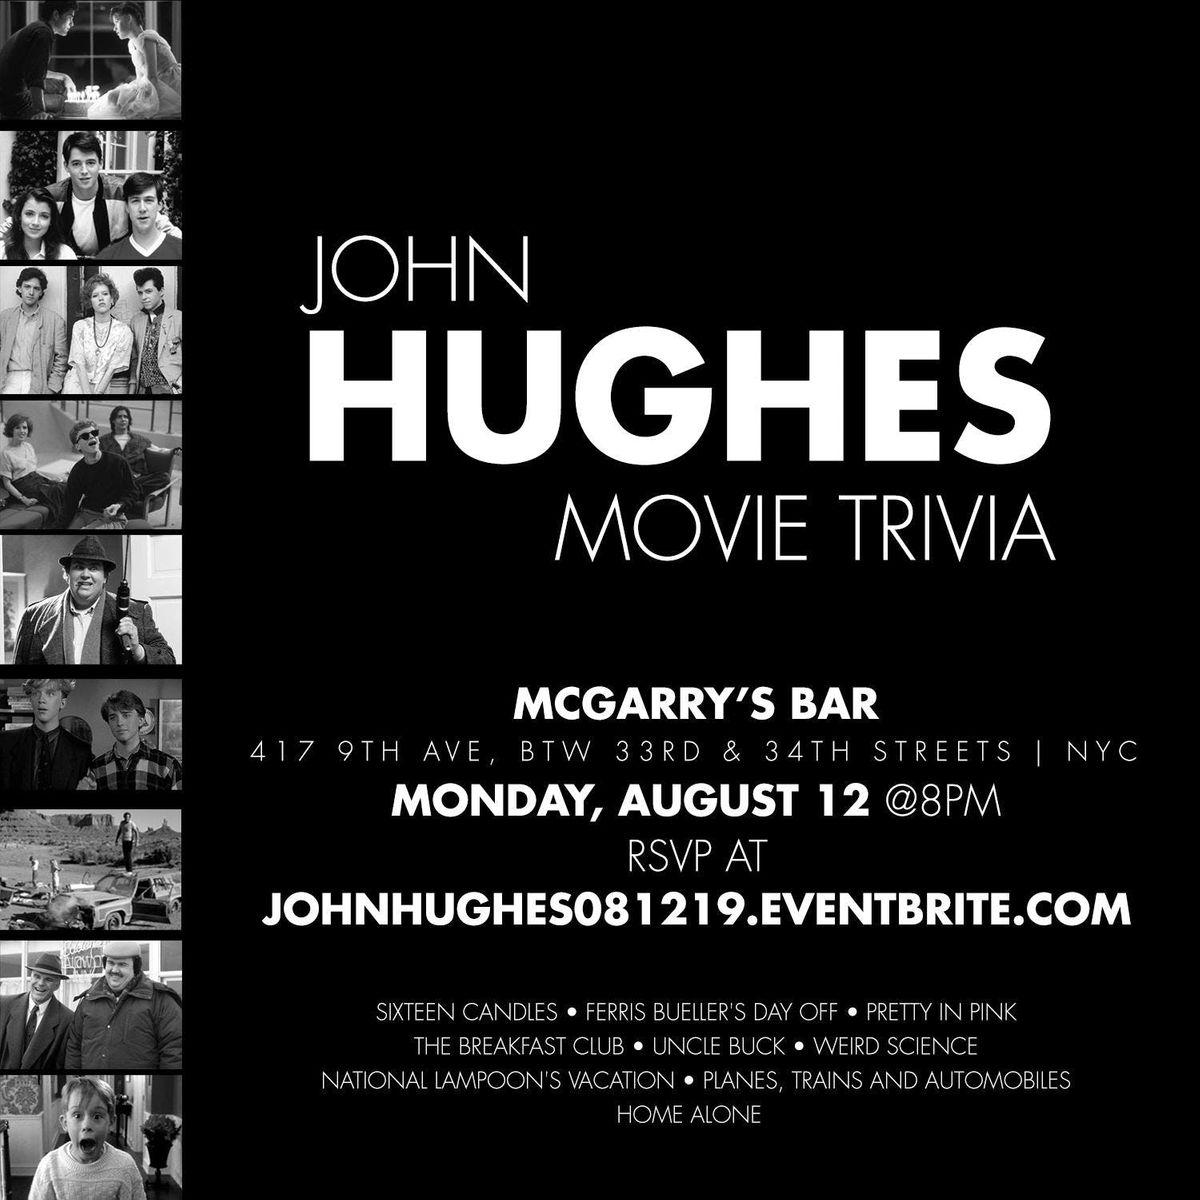 John Hughes Movie Trivia at McGarry's, New York City